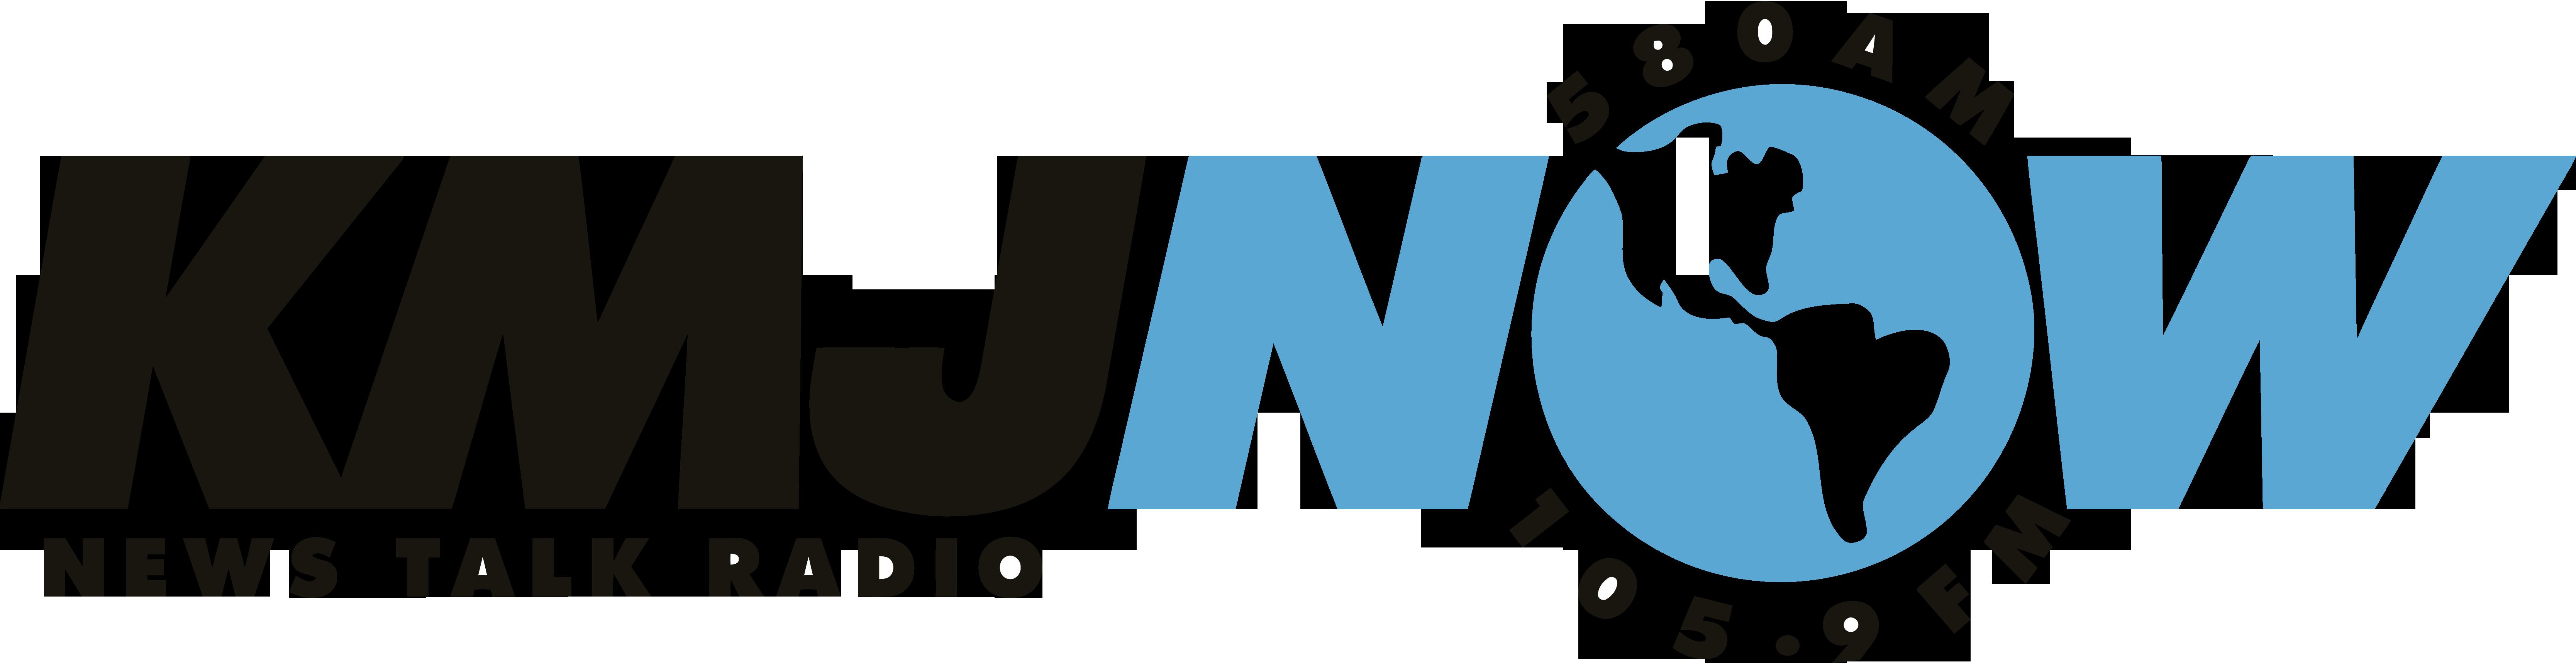 KMJ Logo (Transparent)